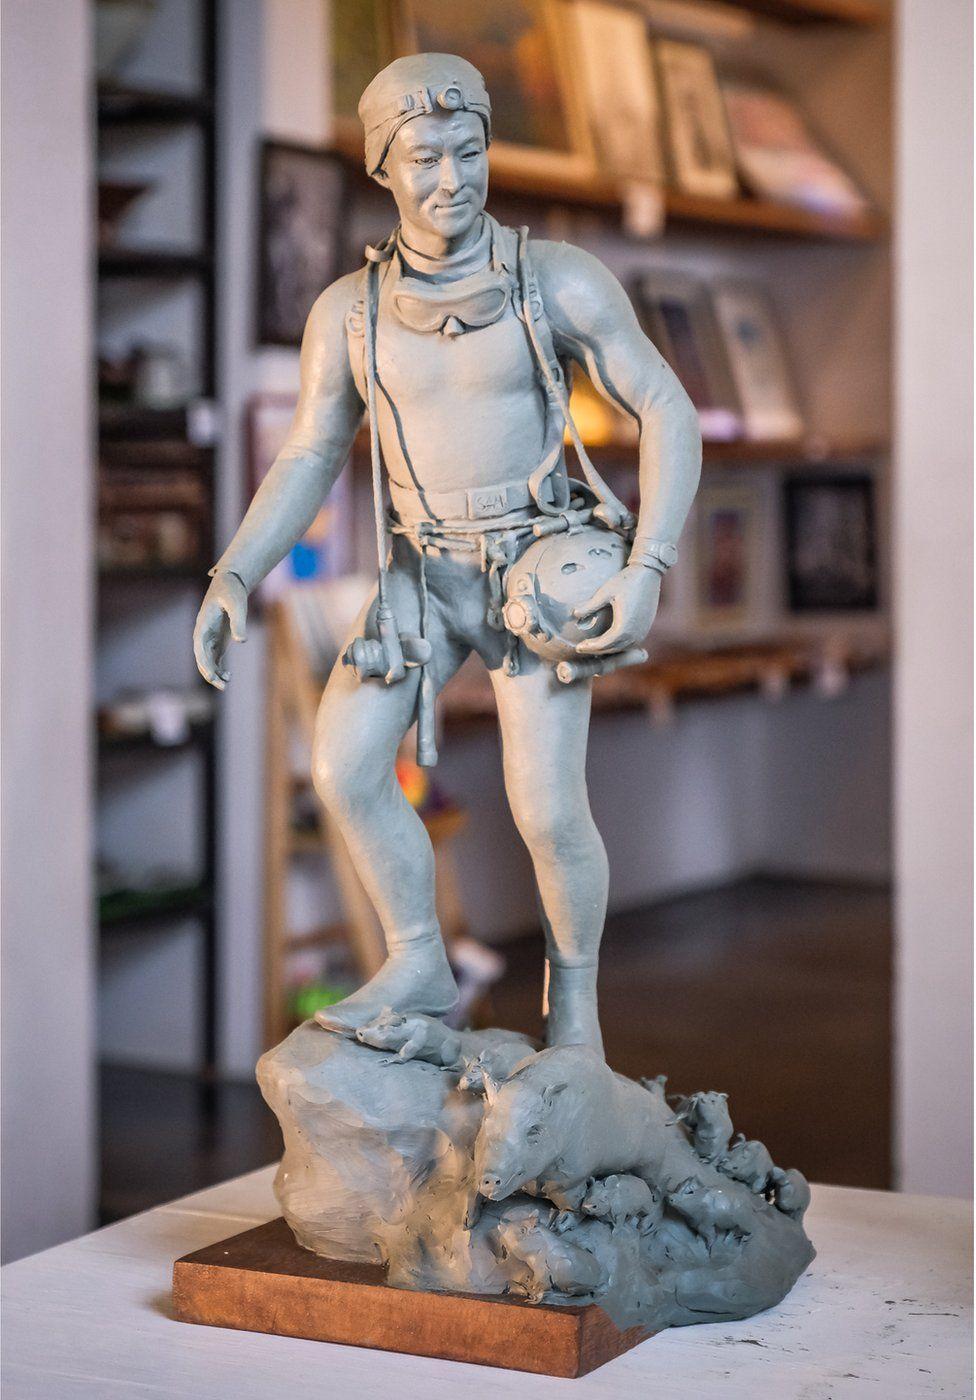 A statue of work former Navy SEAL diver Saman Kunan at Art Bridge gallery in Chiang Rai, Thailand